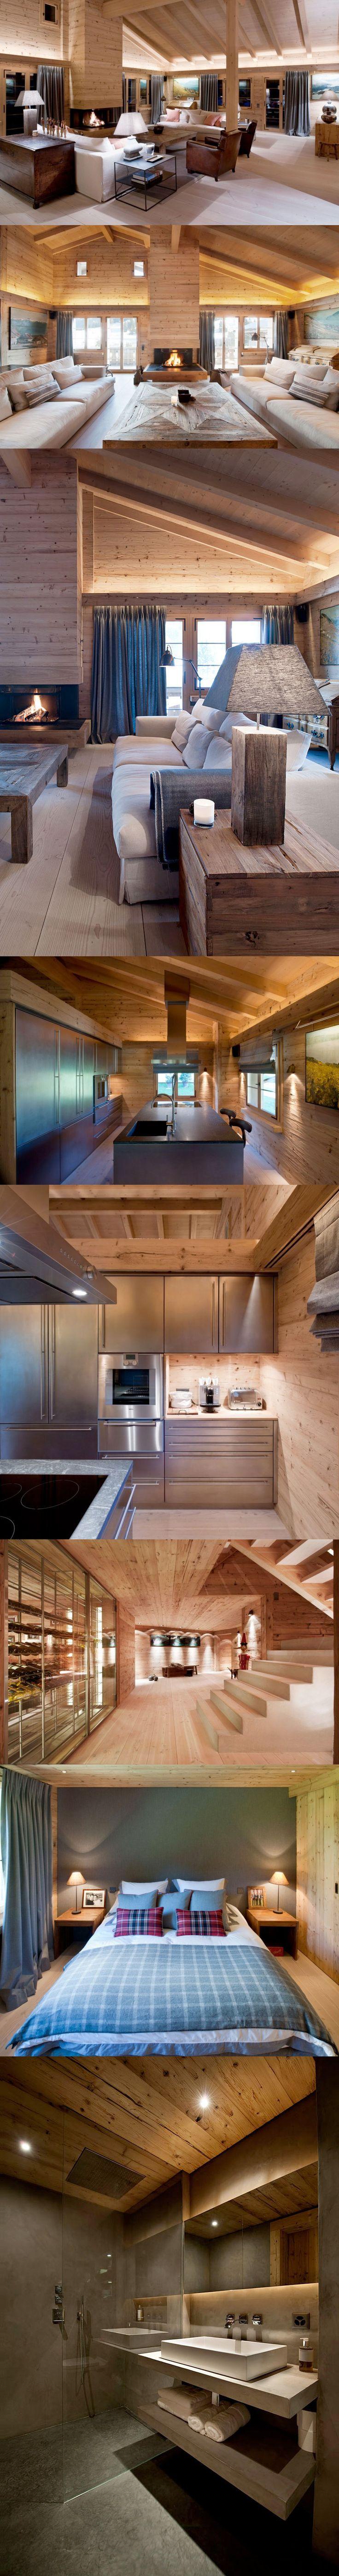 loft conversion ideas glasgow - The 25 best Chalet design ideas on Pinterest